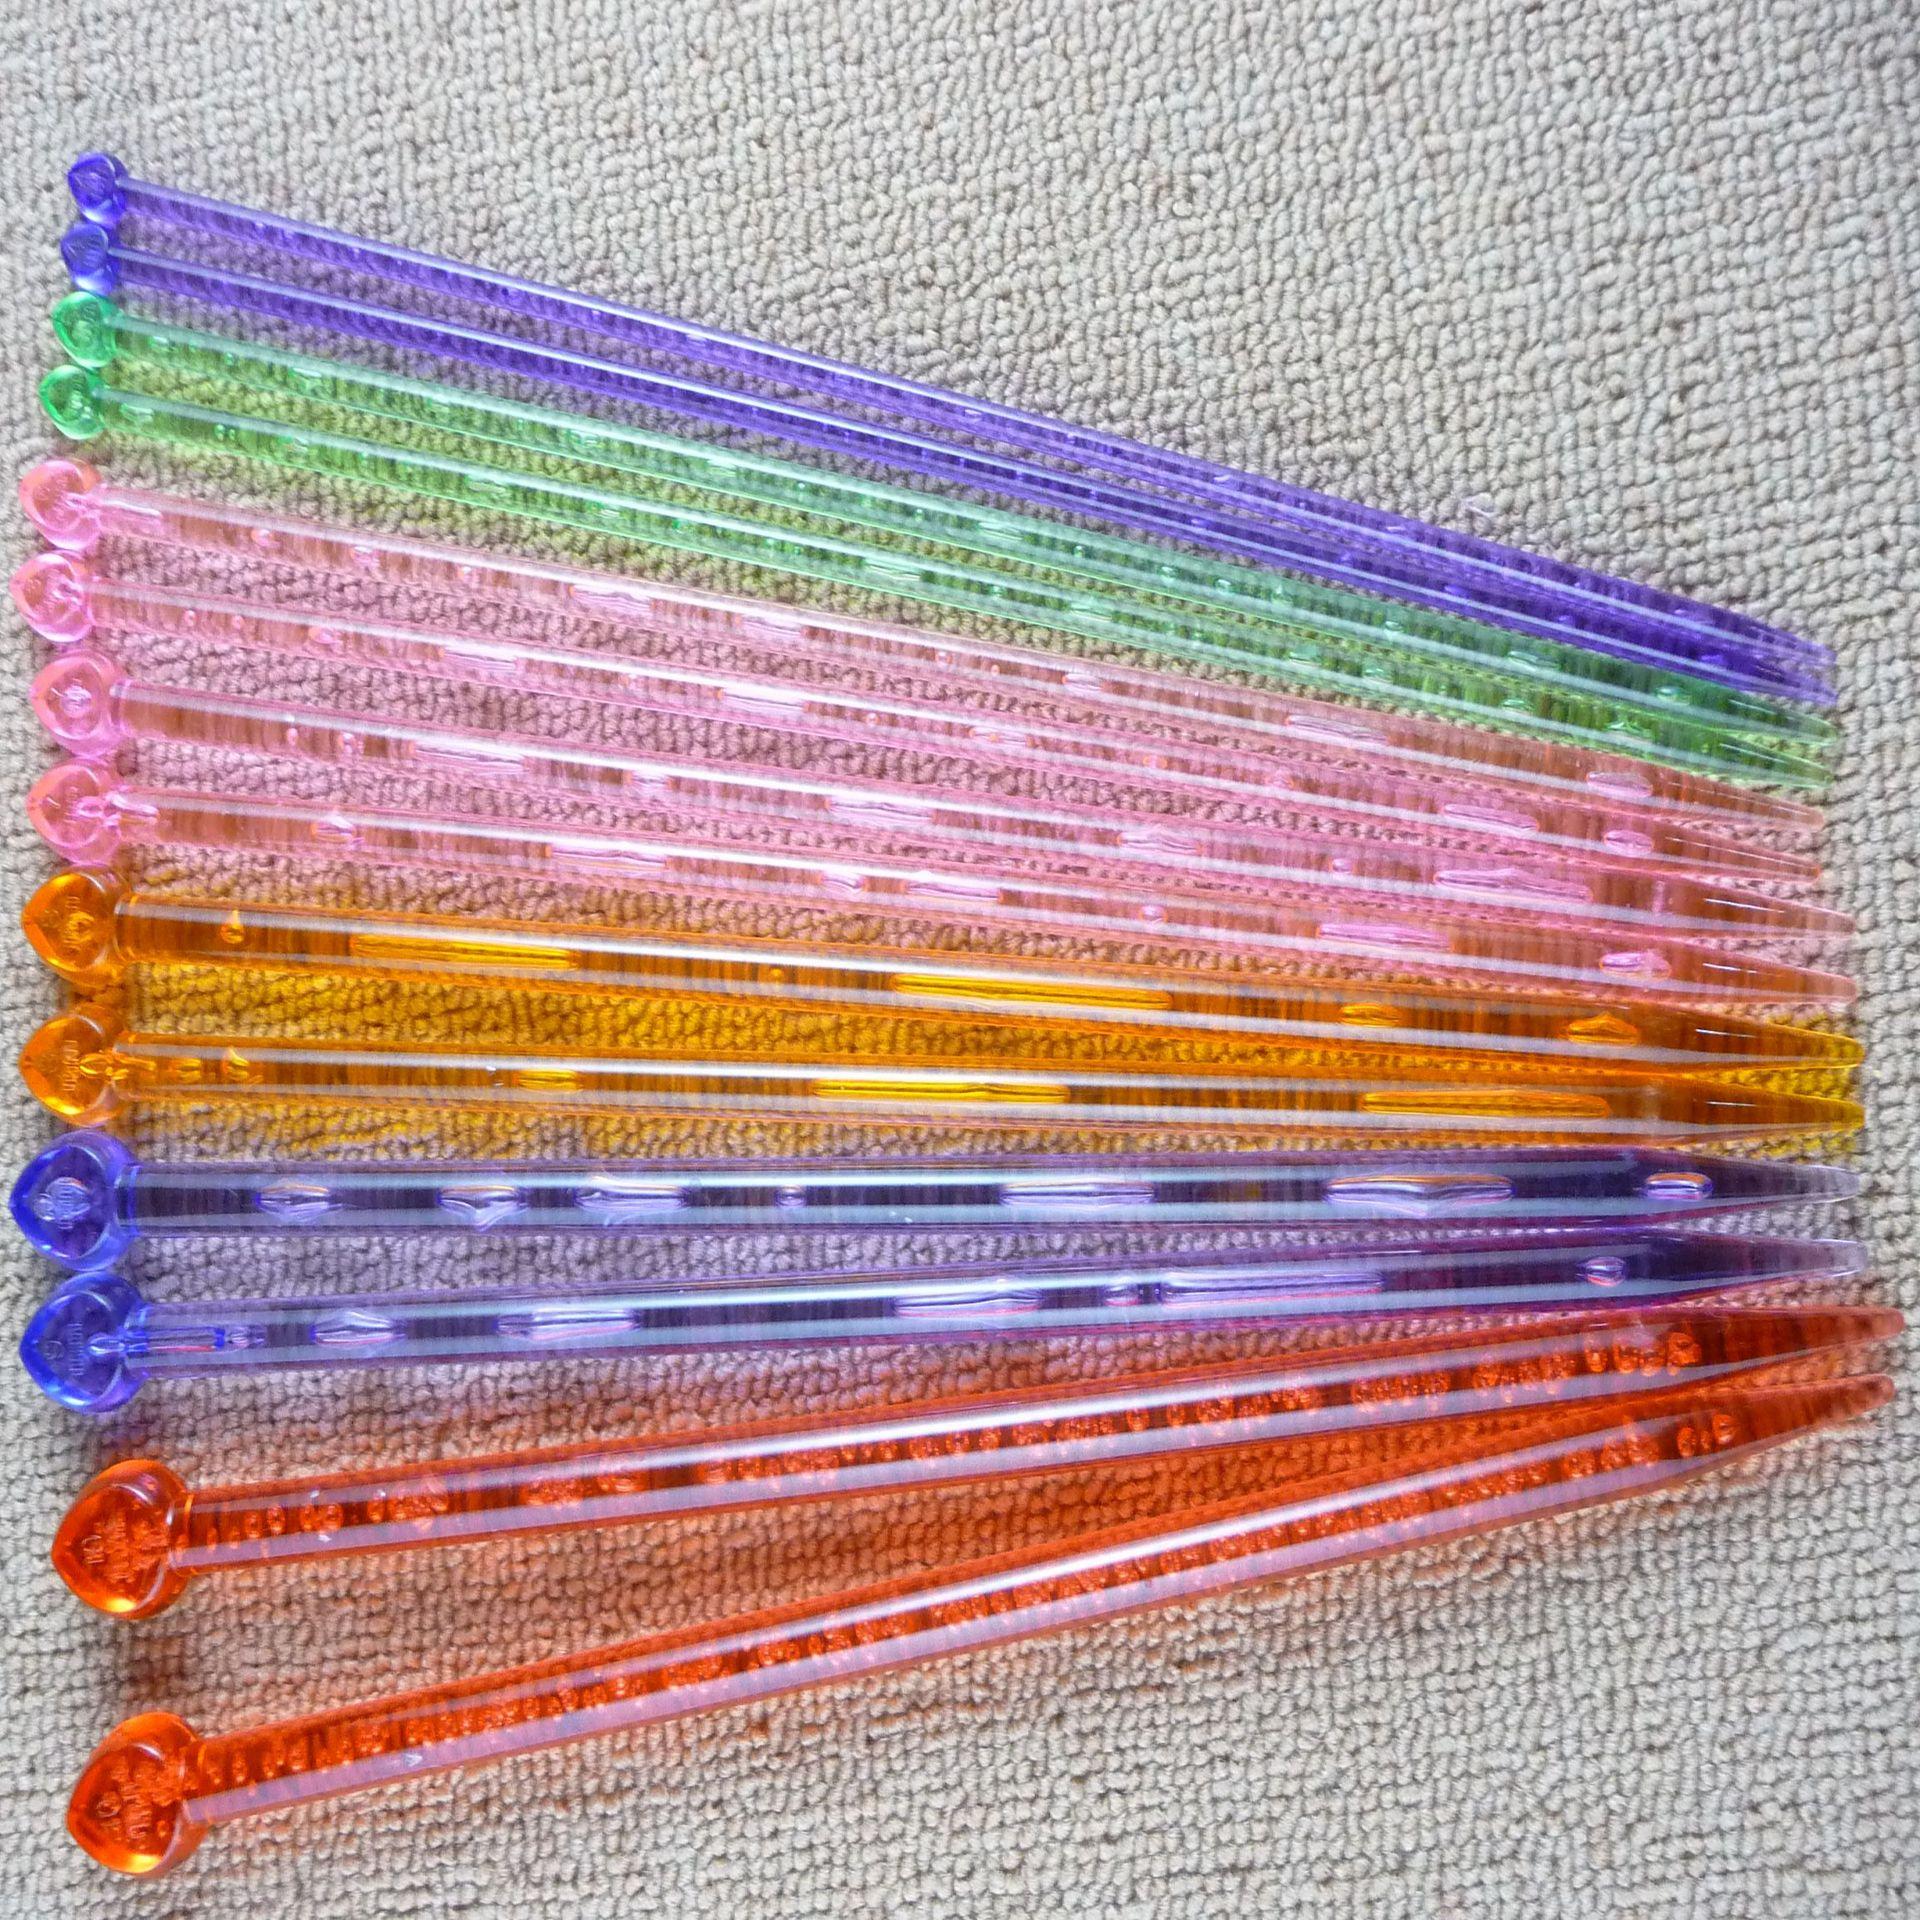 14pcs/set Multi-color Knitting Needles Knit Crochet Hooks Plastic Craft Weave Craft Plastic Single Pointed Knitting Sticks